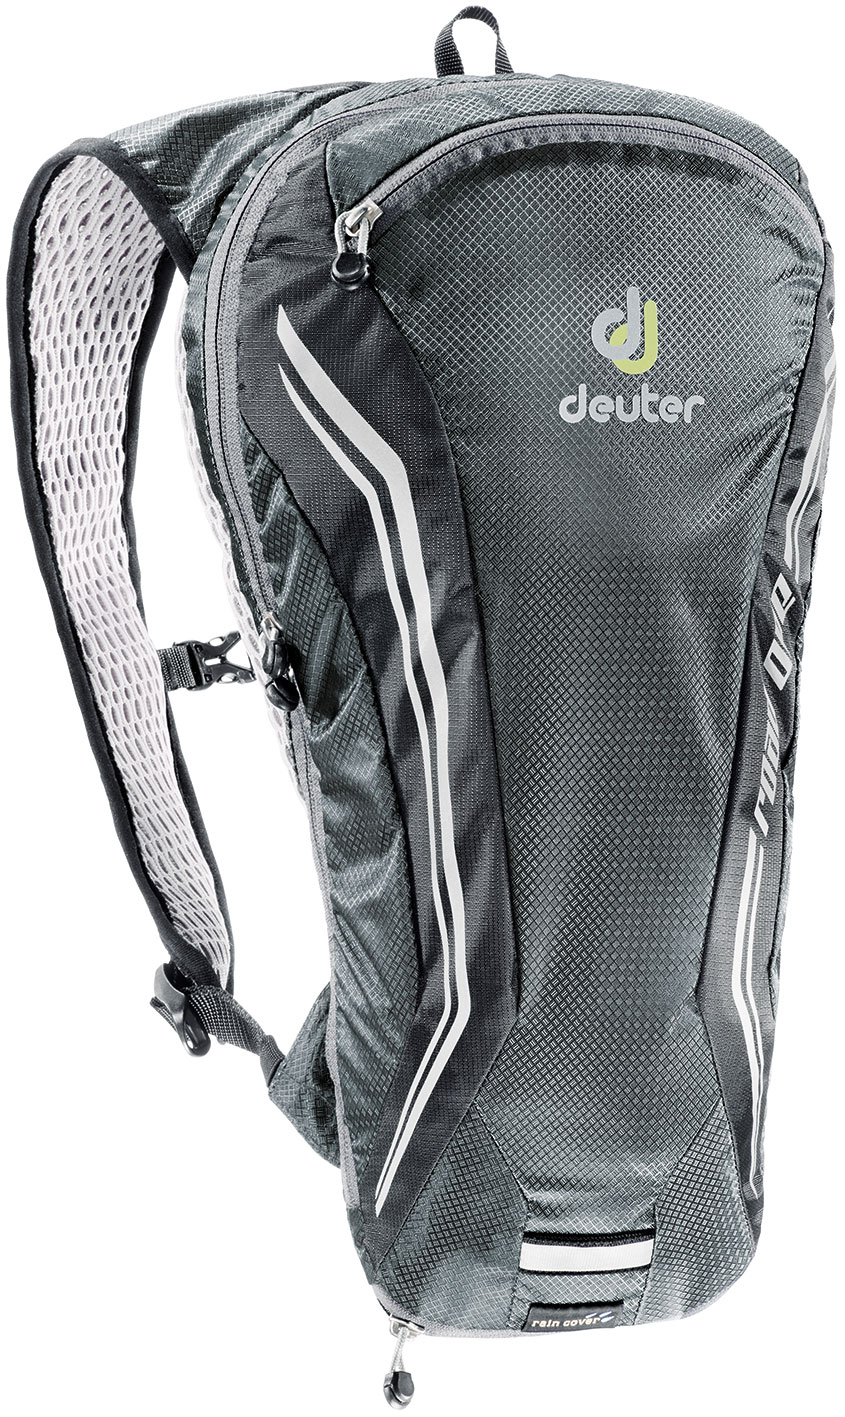 Deuter - Road One granite-black - Bike Backpacks -